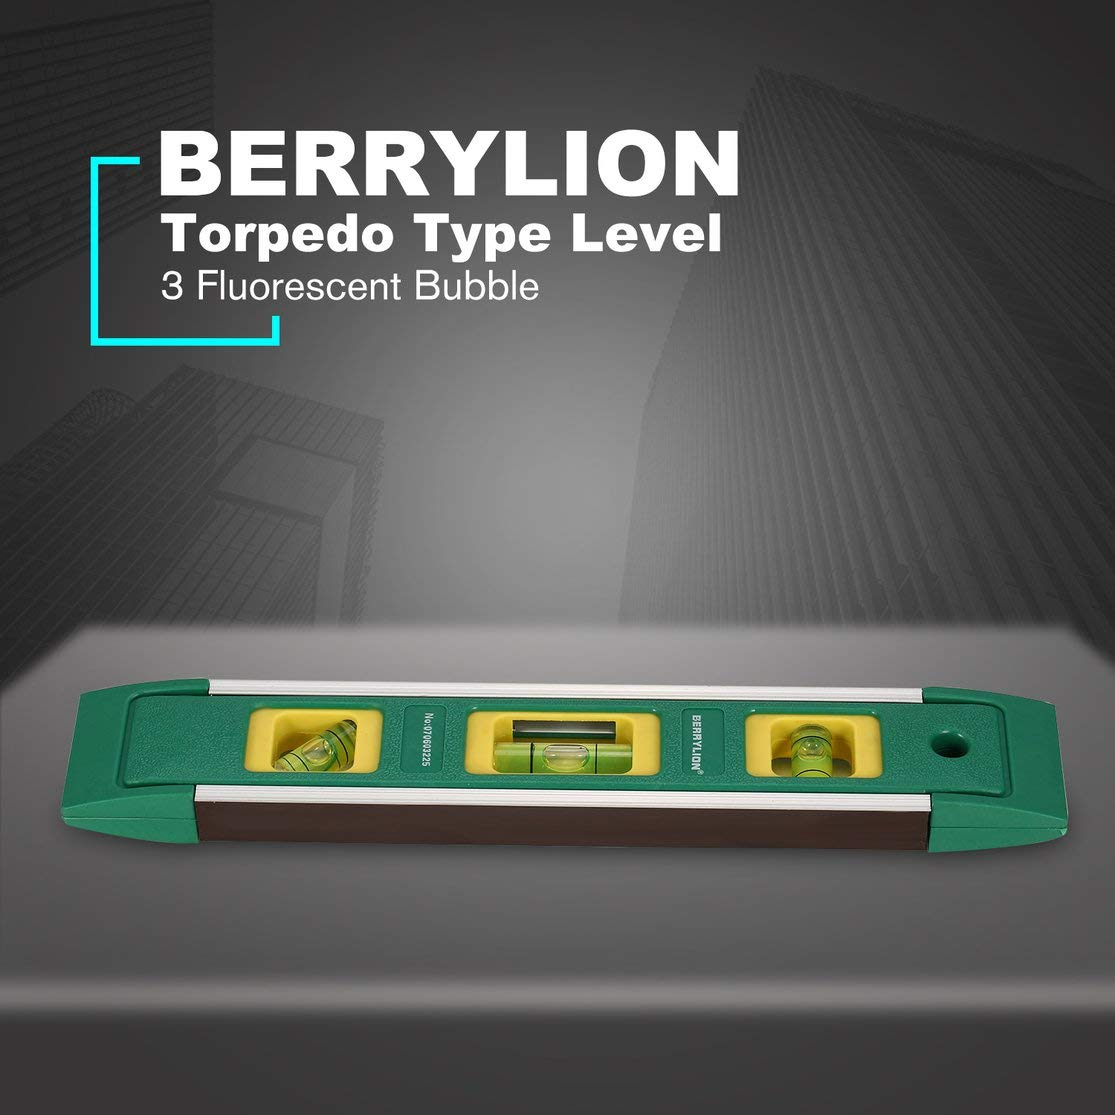 BERRYLION Tipo de torpedo Nivel 225 mm Gradienter magn/ético Spirit 3 Regla de burbuja fluorescente Herramienta de medici/ón vertical horizontal Kaemma Color: verde